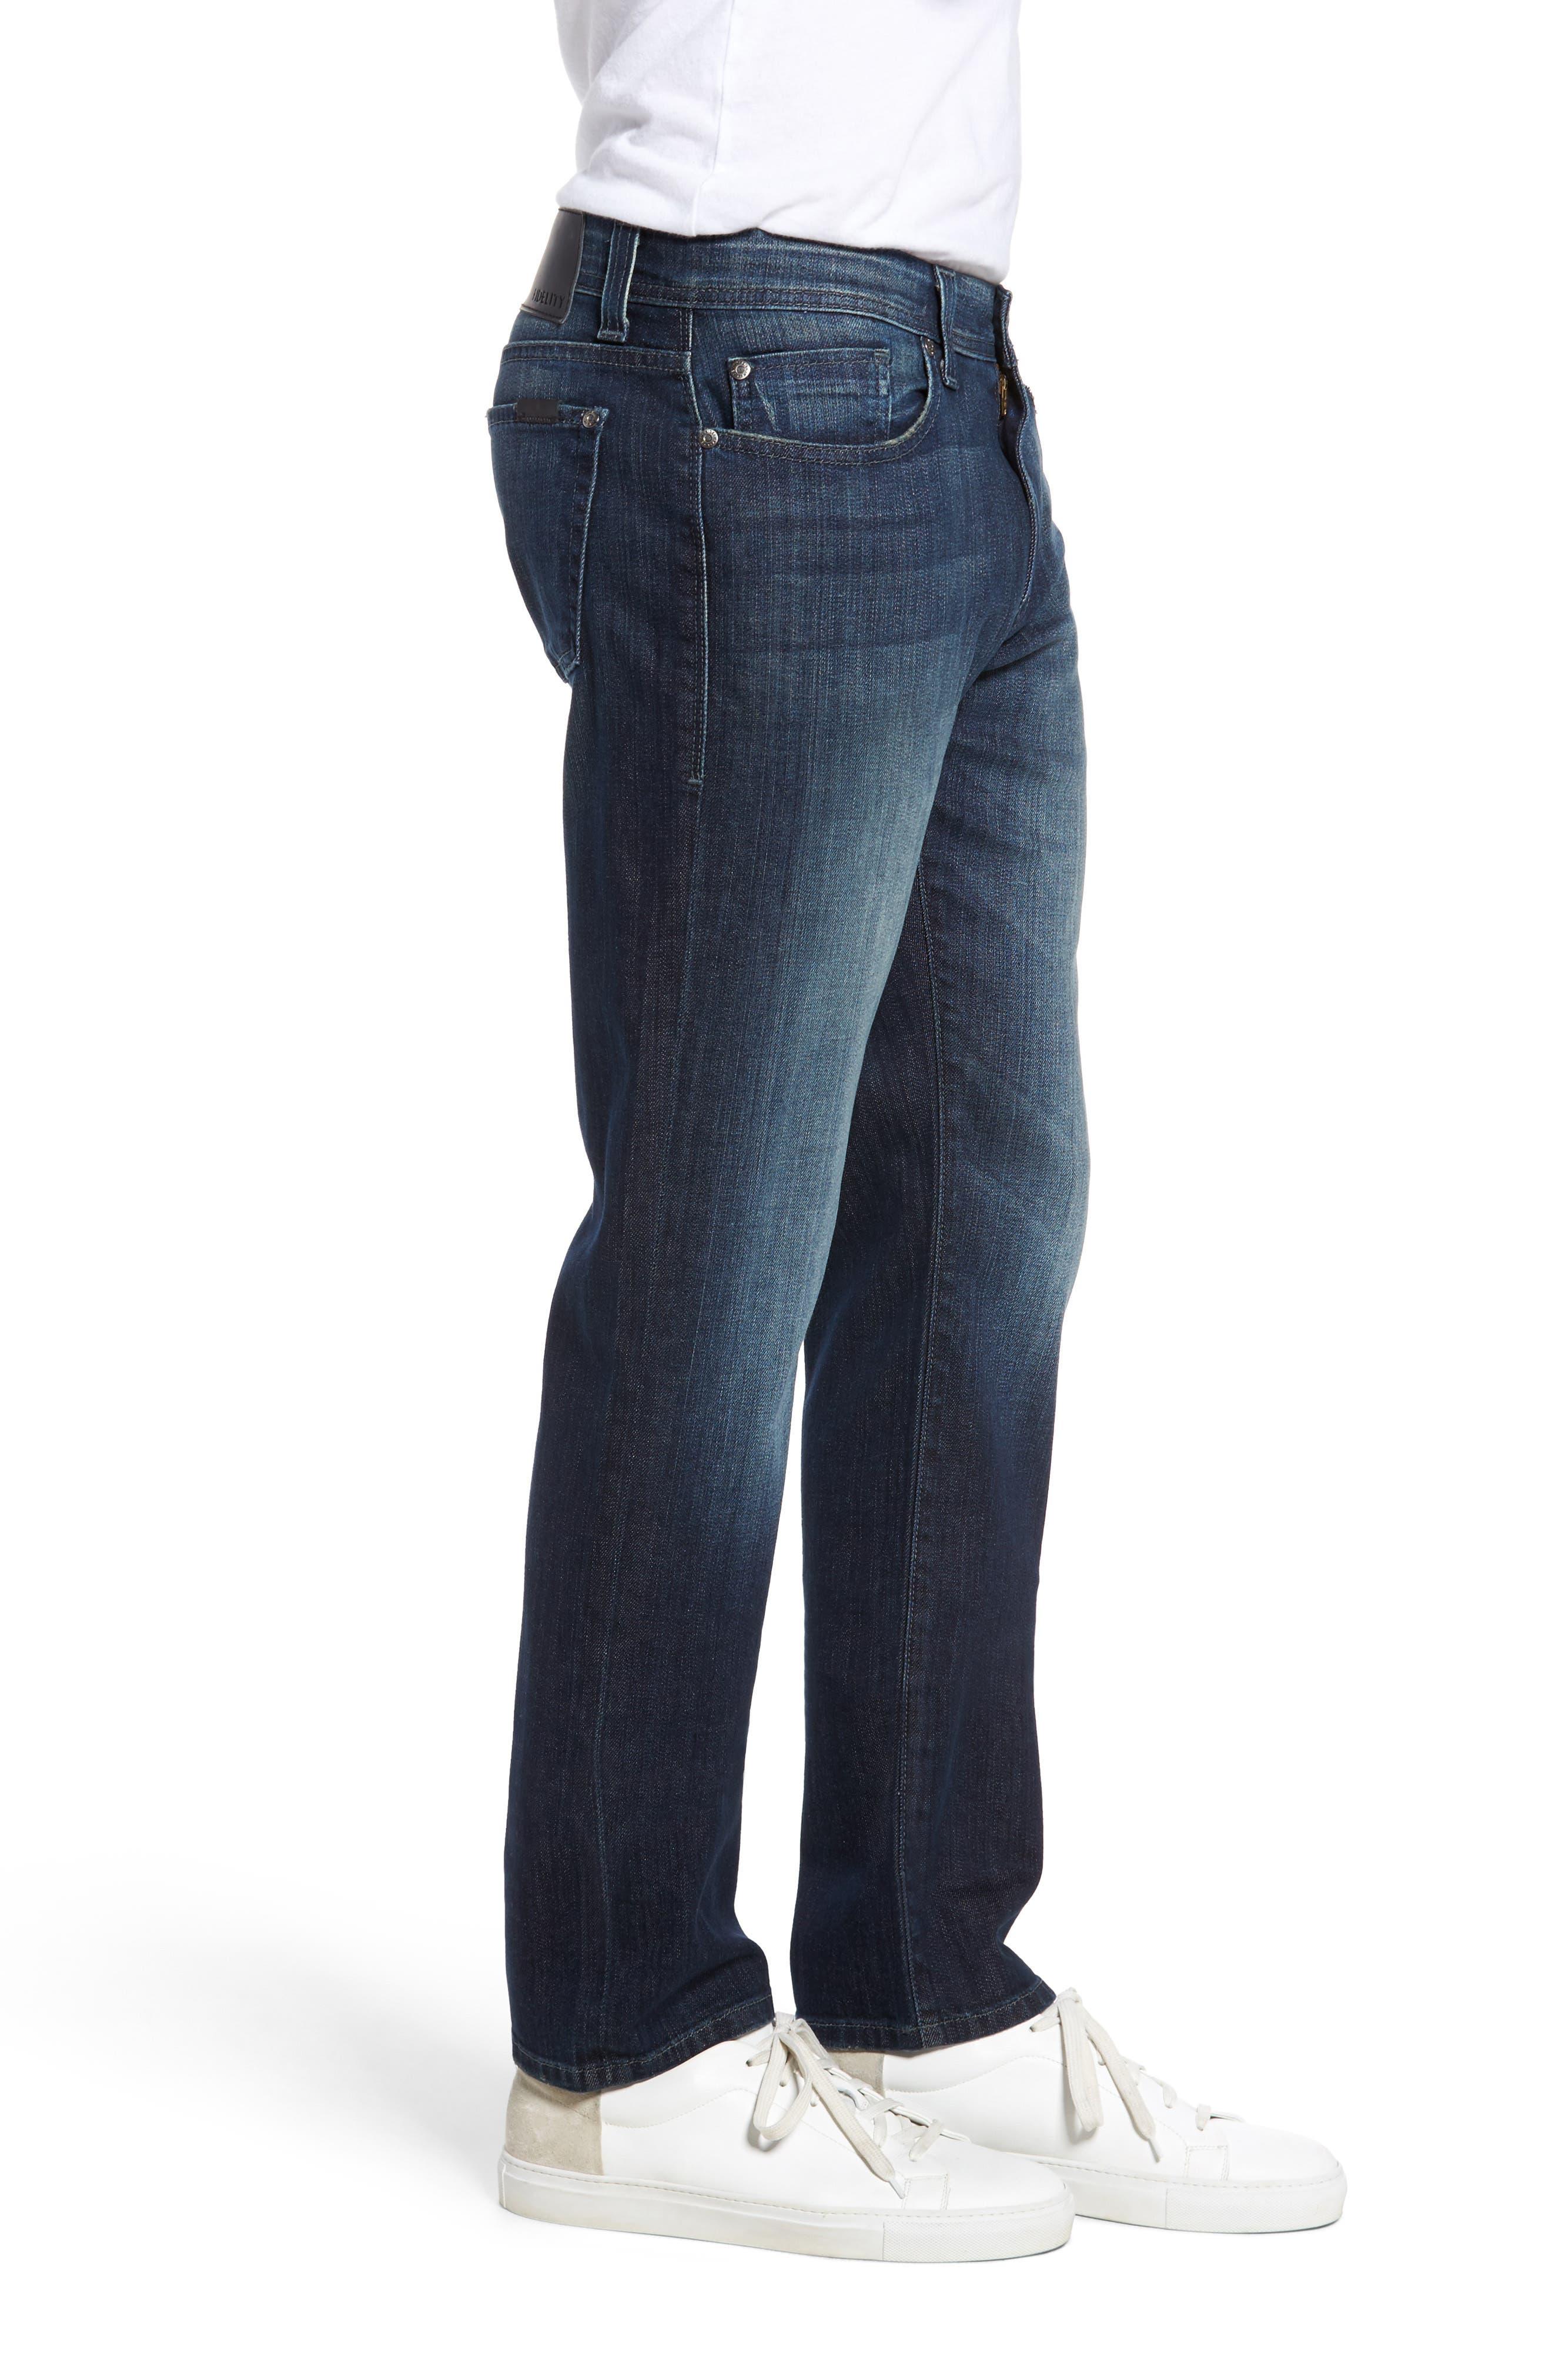 Alternate Image 3  - Fidelity Denim Jimmy Slim Straight Leg Jeans (Militia Blue)